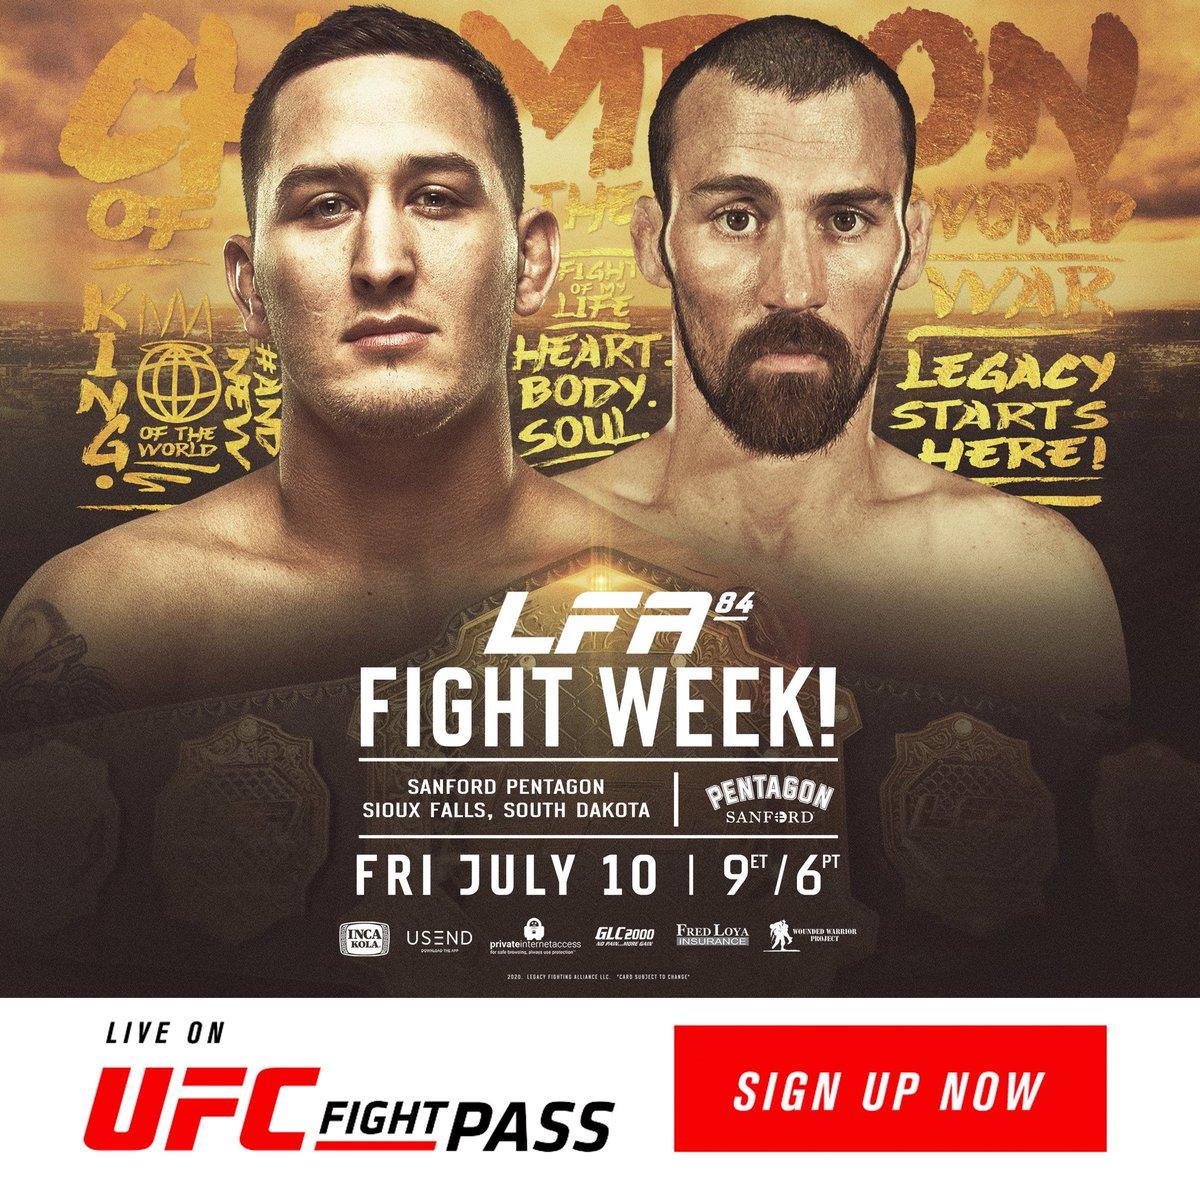 It's #FightWeek and @LFAfighting brings the #Featherweight Championship to #SouthDakota at #LFA84! 🏆  @JTrain_1991 vs.  #JakeChilders  Friday, July 10 @SanfordPentagon #SiouxFalls, #SouthDakota  #MMA #LFANation @UFCFightPass https://t.co/xp82GSdHRY